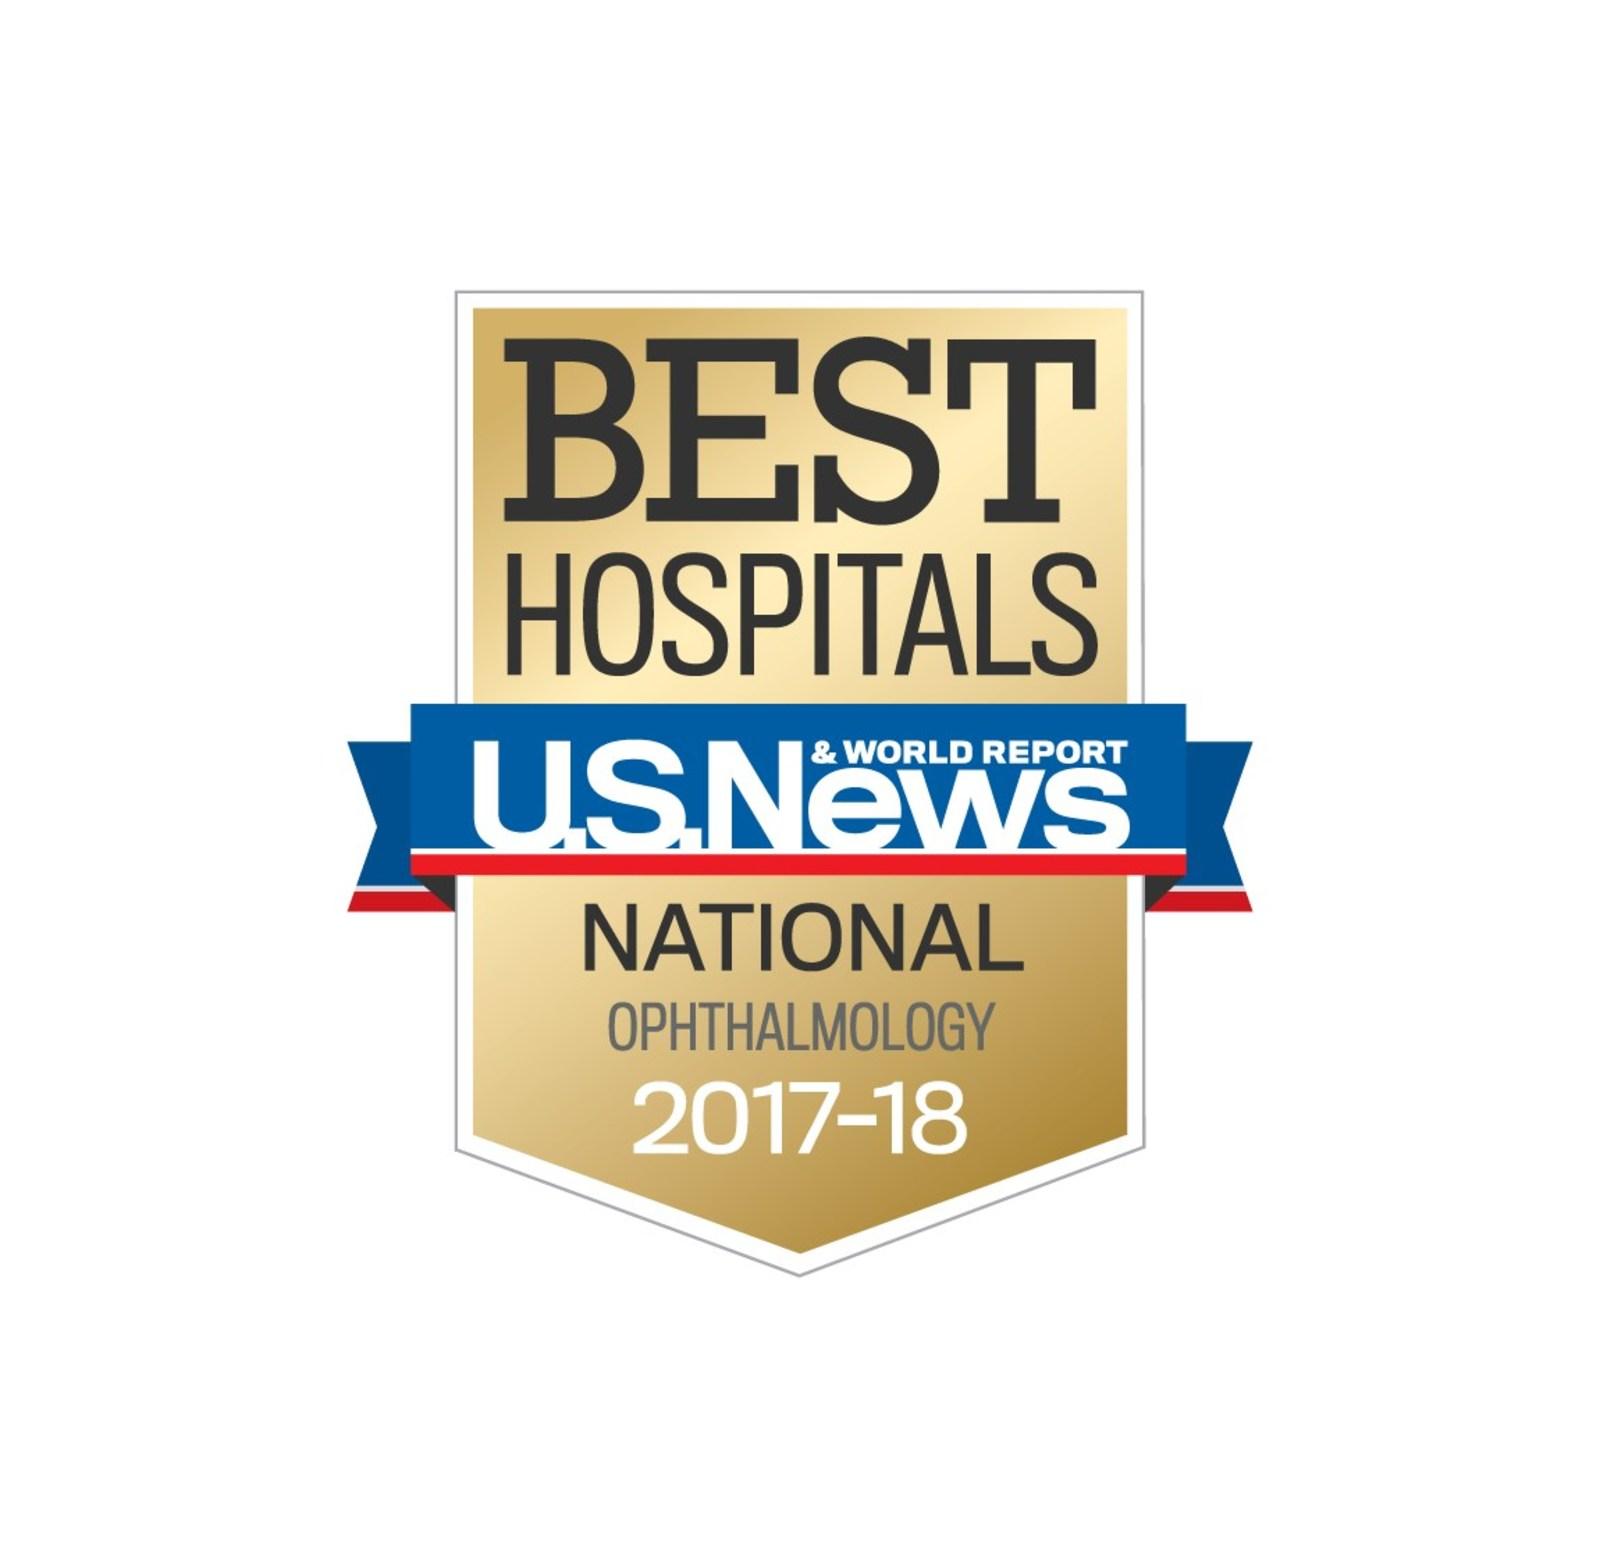 [MEDSCAPE新闻]:Mayo Clinic与Cleveland Clinic领跑美国新闻最佳医院排行榜